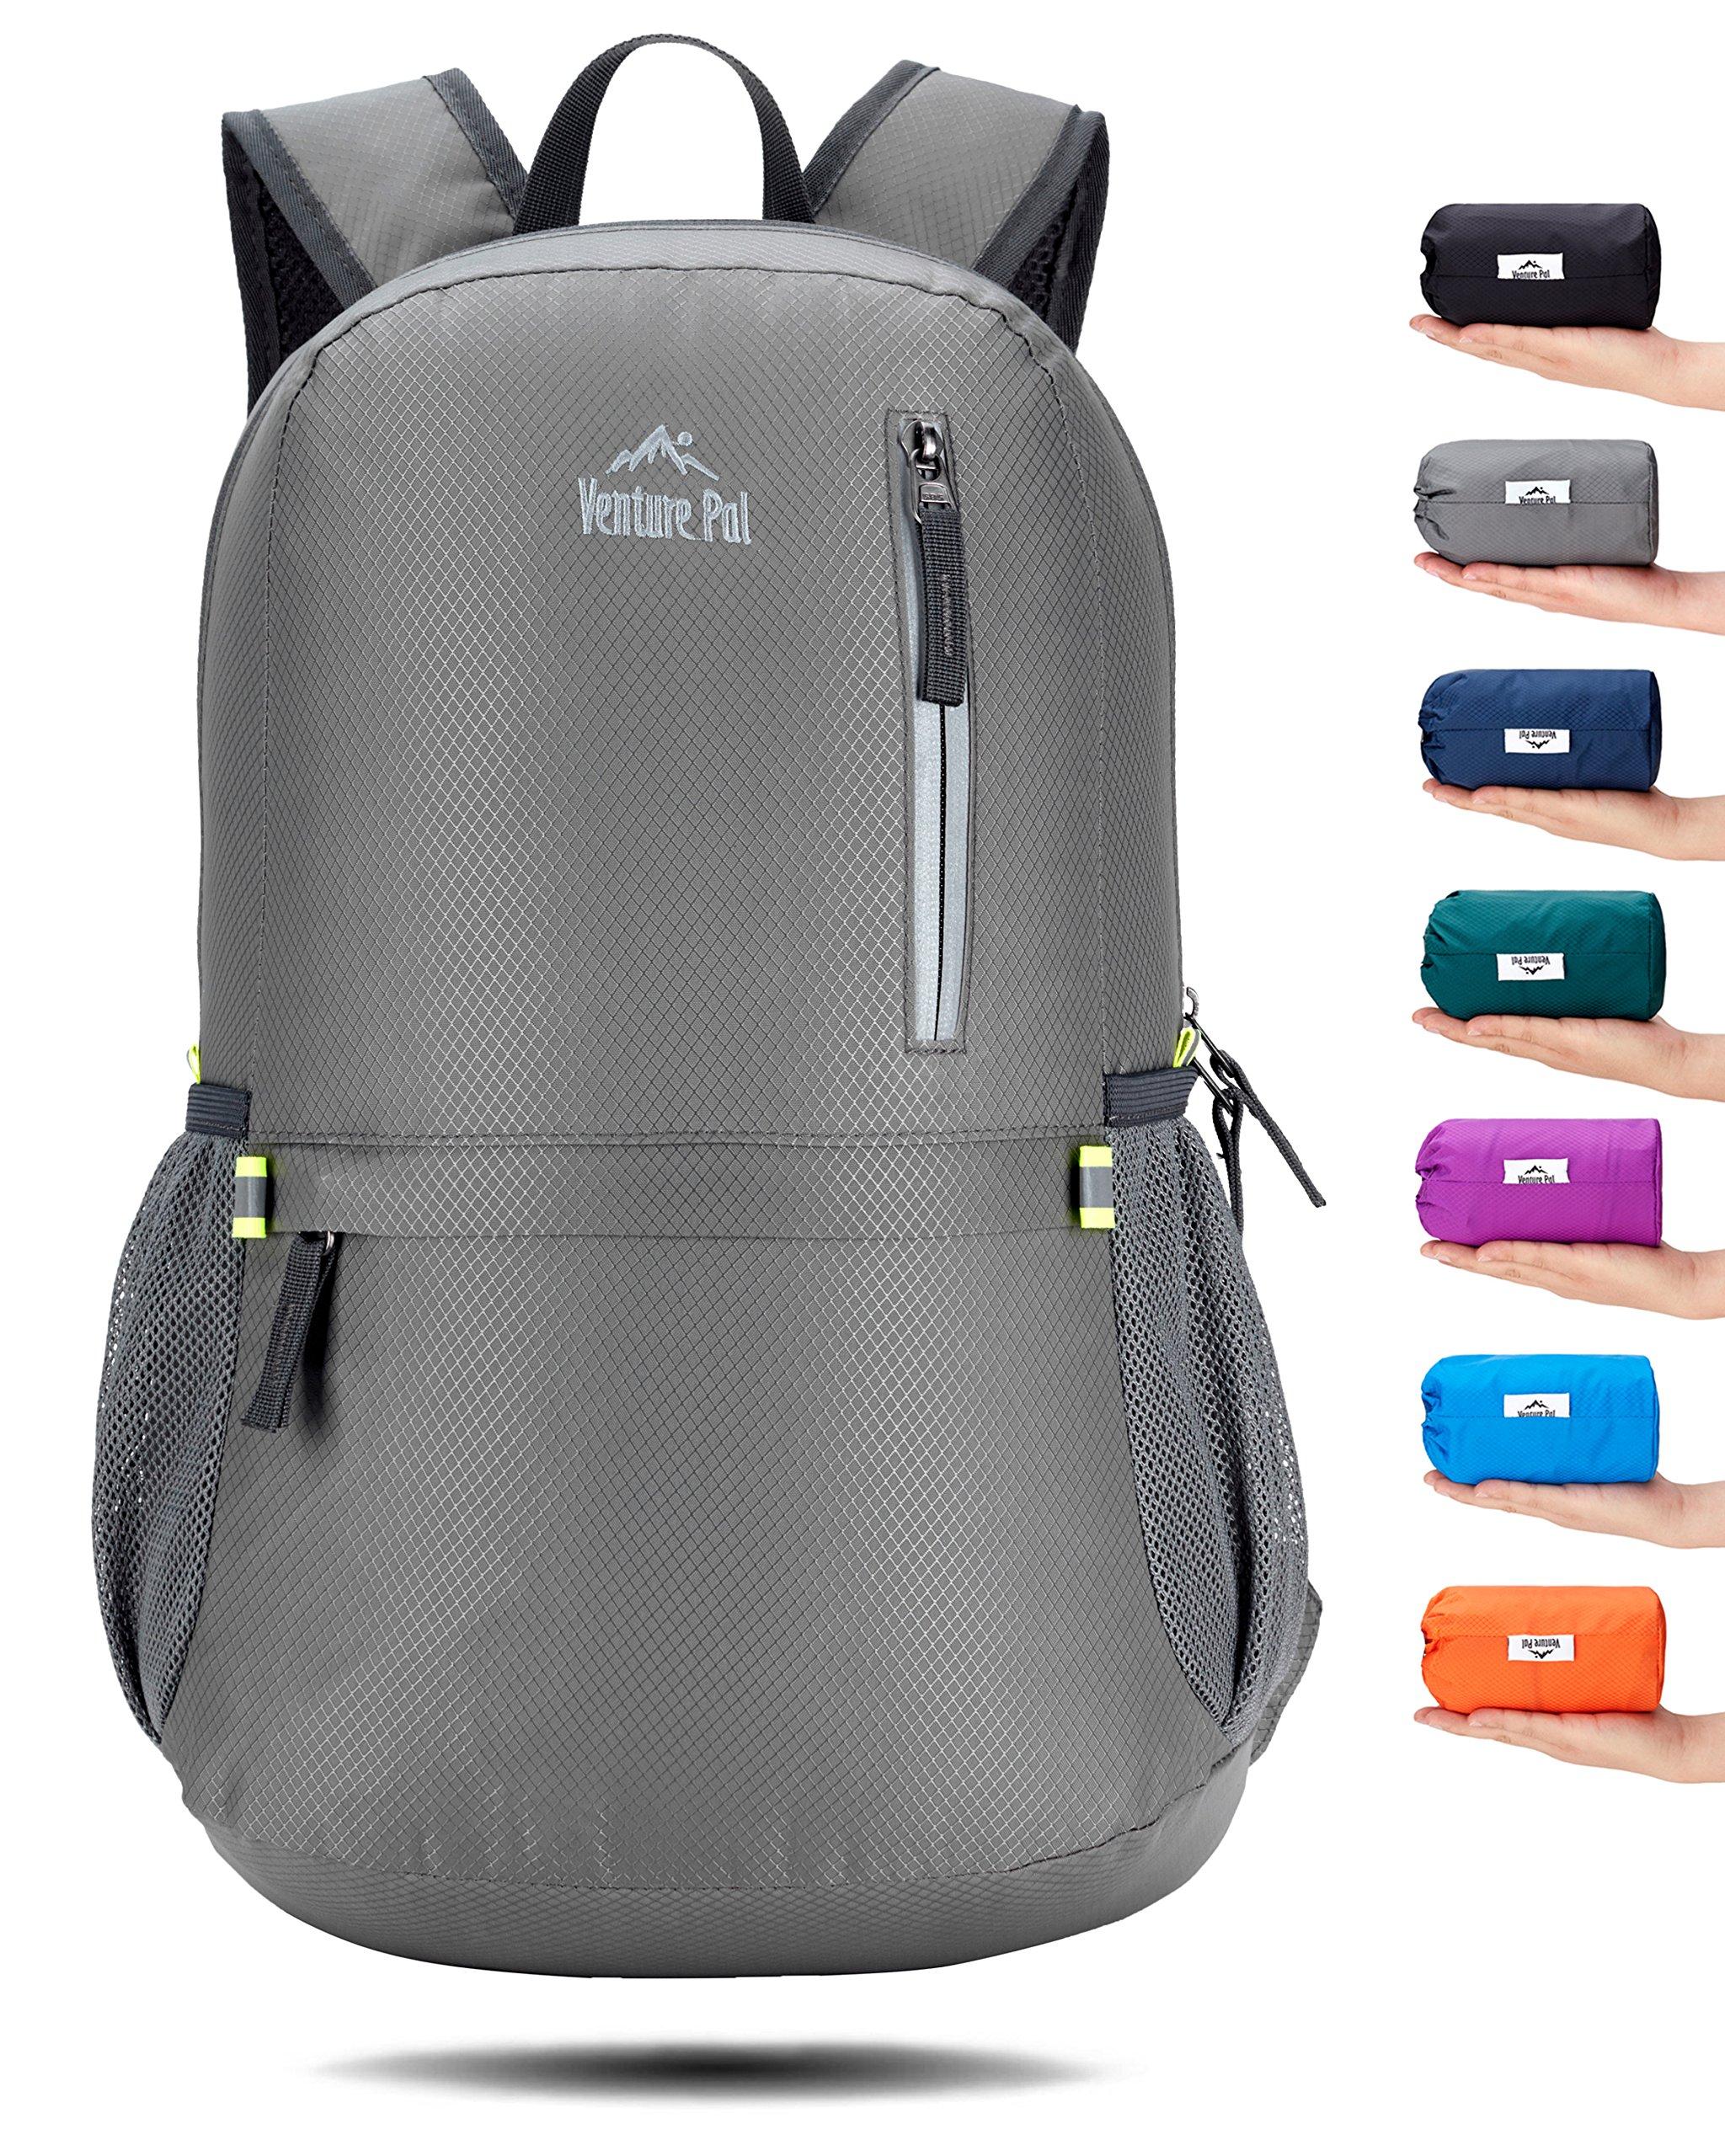 Venture Pal 25L Travel Backpack - Durable Packable Lightweight Small Backpack Women Men (Grey)